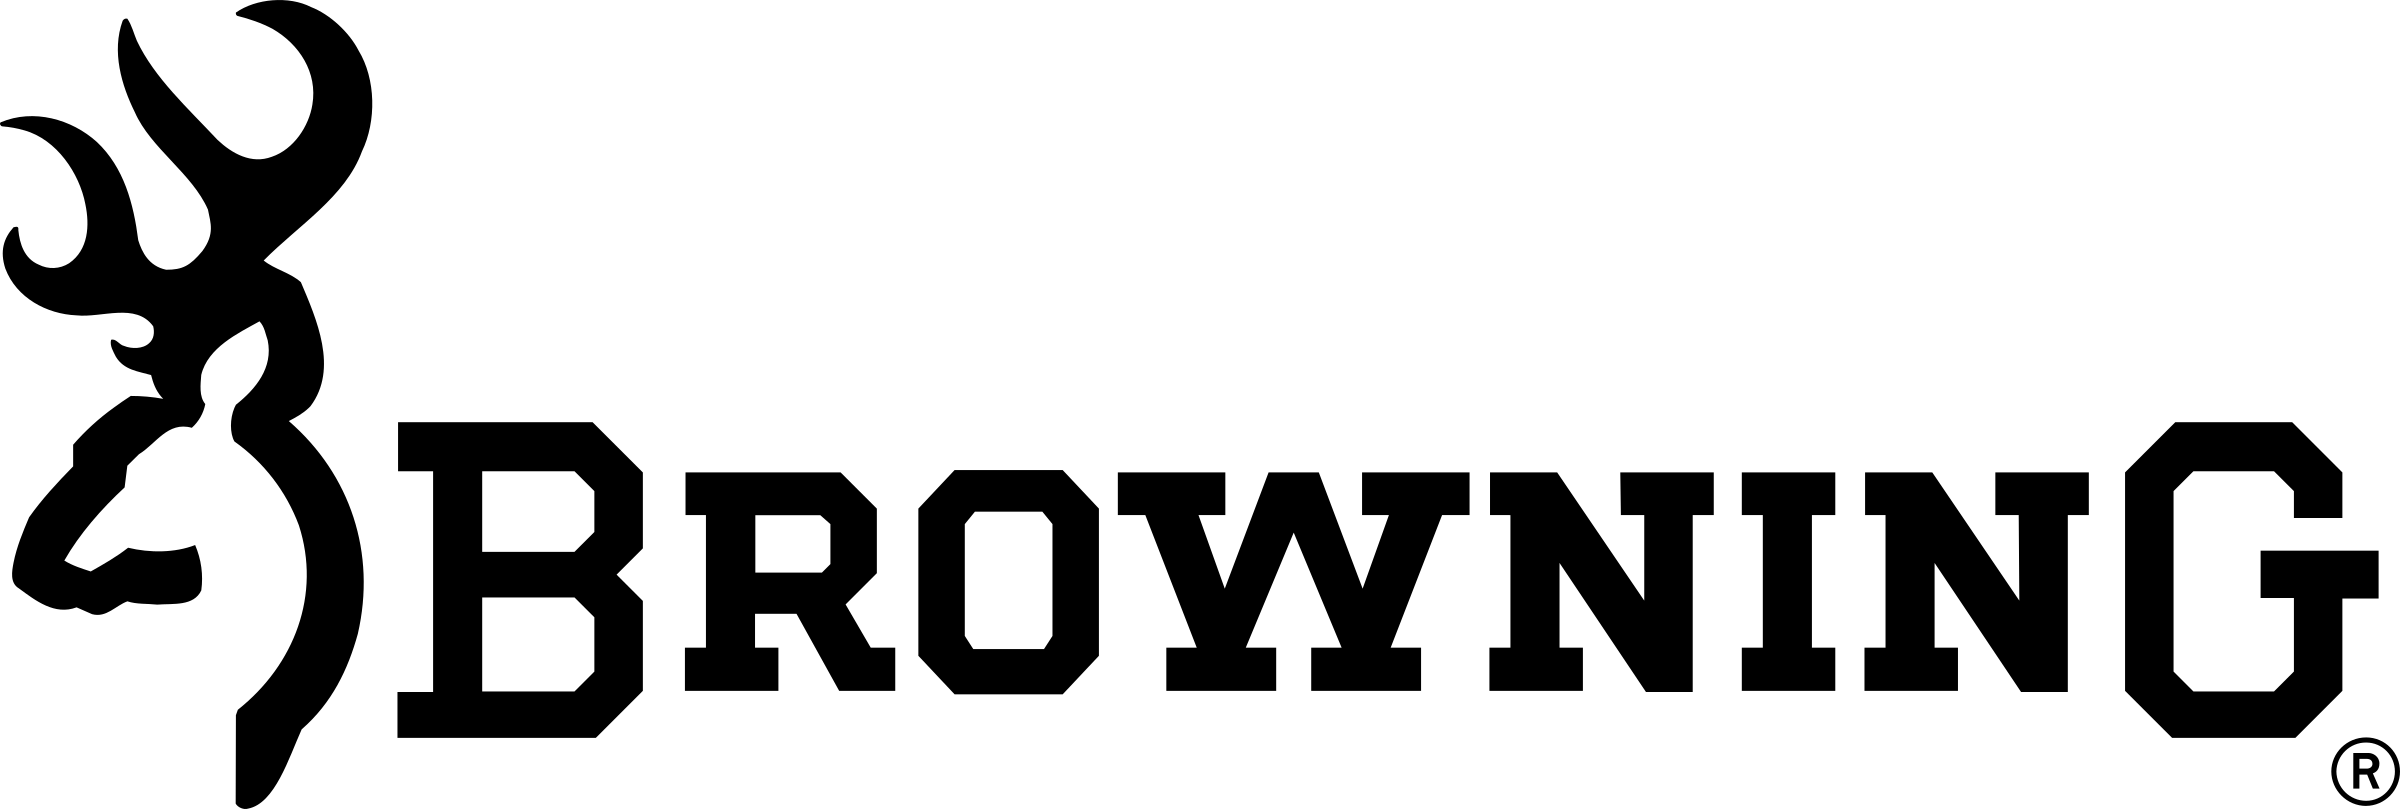 Image result for browning logo png